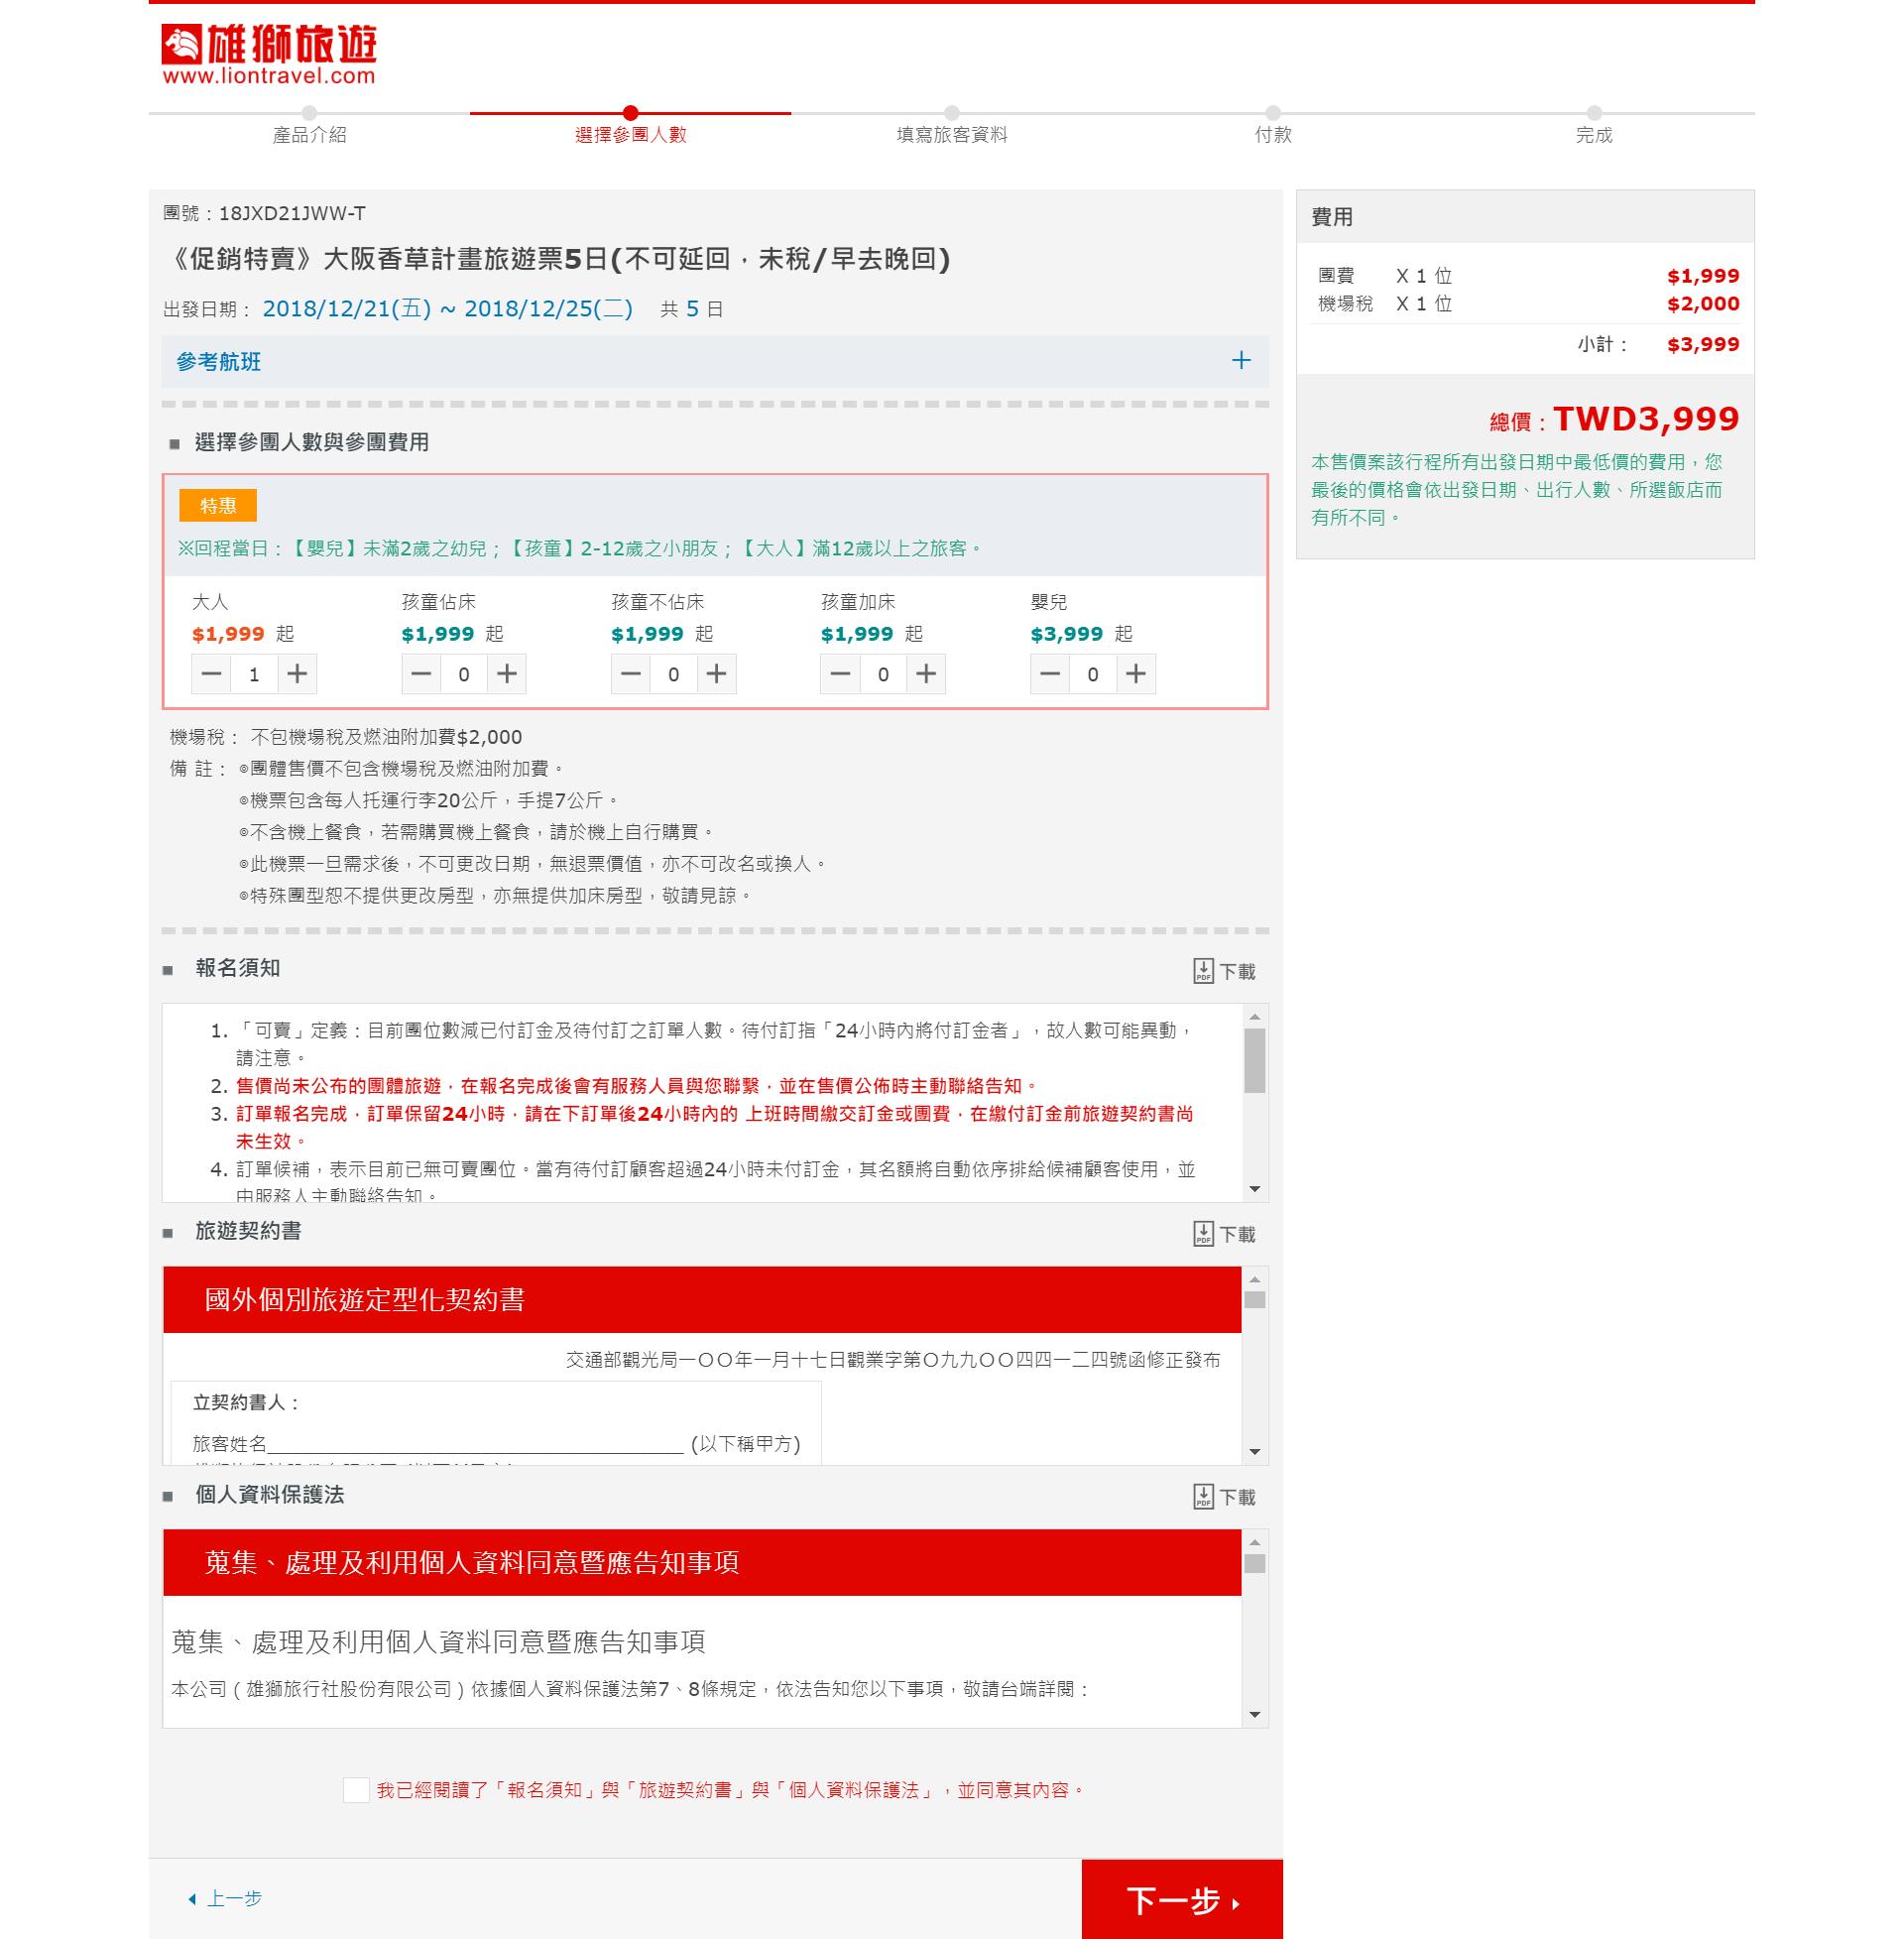 FireShot Capture 034 - 雄獅旅遊網:規劃旅遊行程、機票、訂房、自由行的首選網站_ - https___travel.liontravel.com_order_choose.png